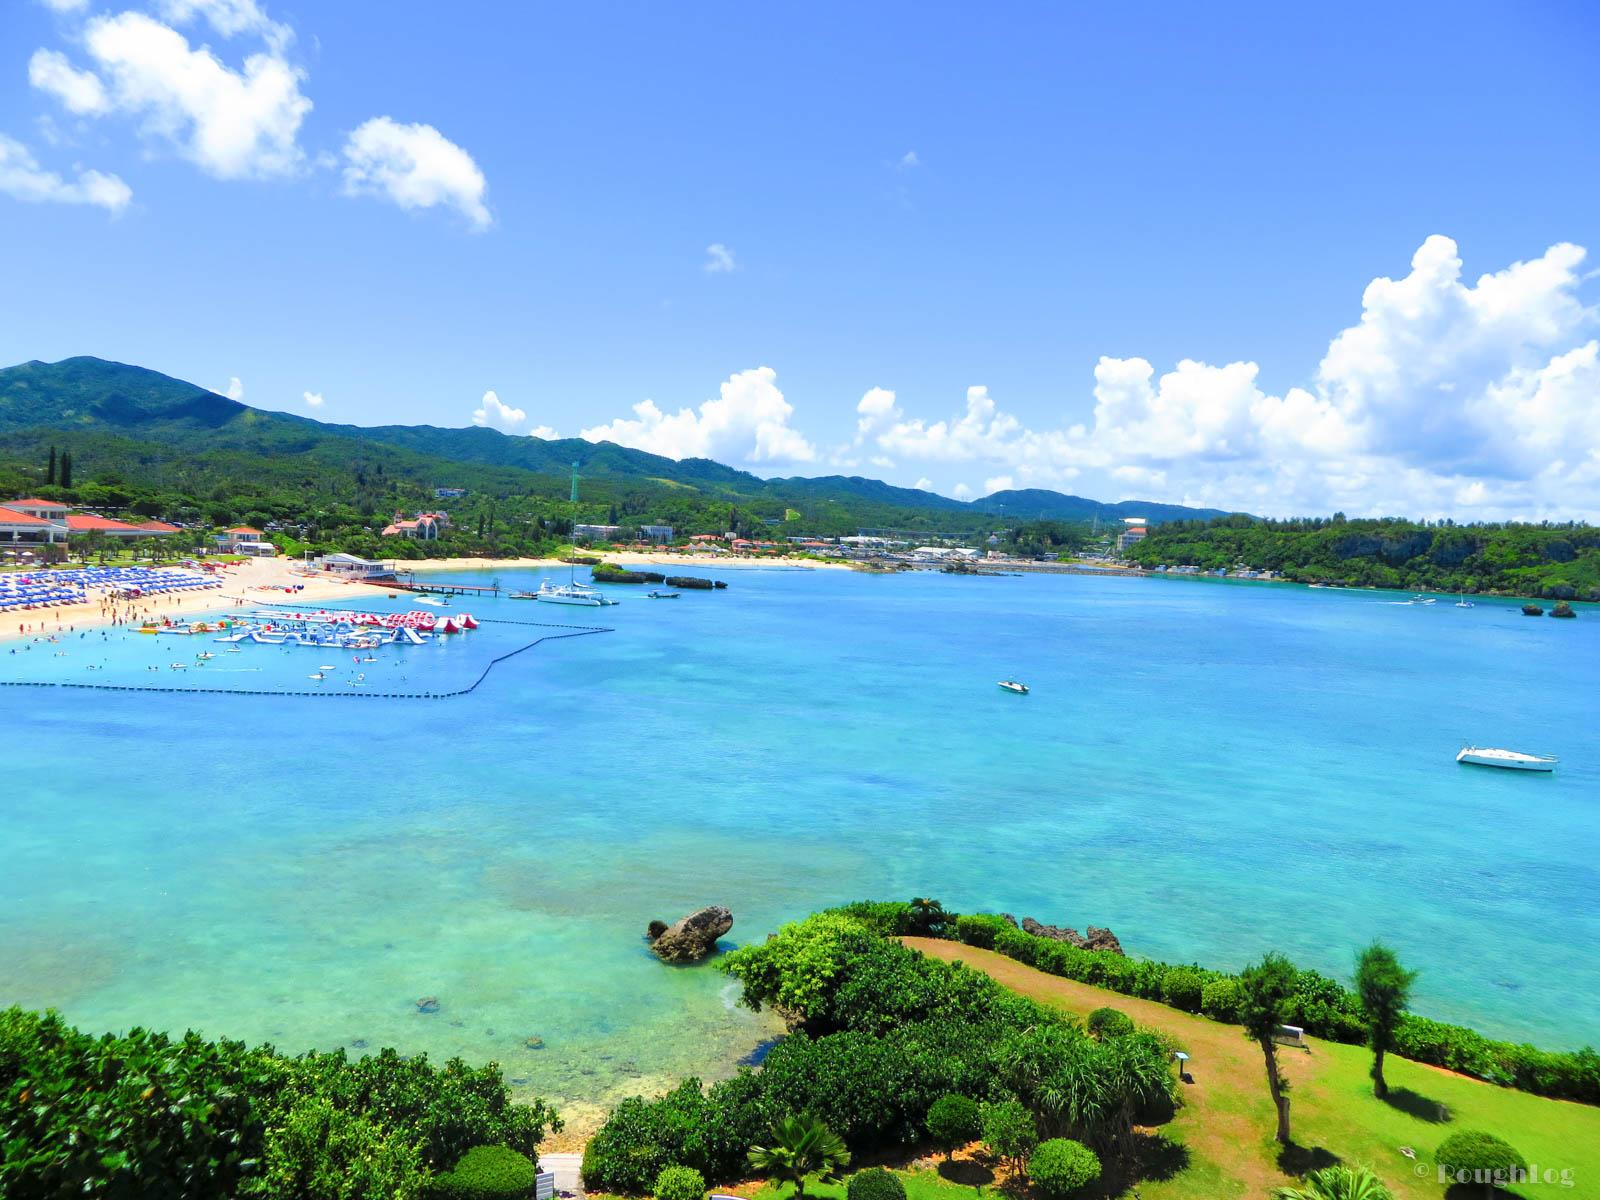 ANAインターコンチネンタル万座ビーチリゾートのホテル客室から眺める沖縄の海(万座ビーチ)